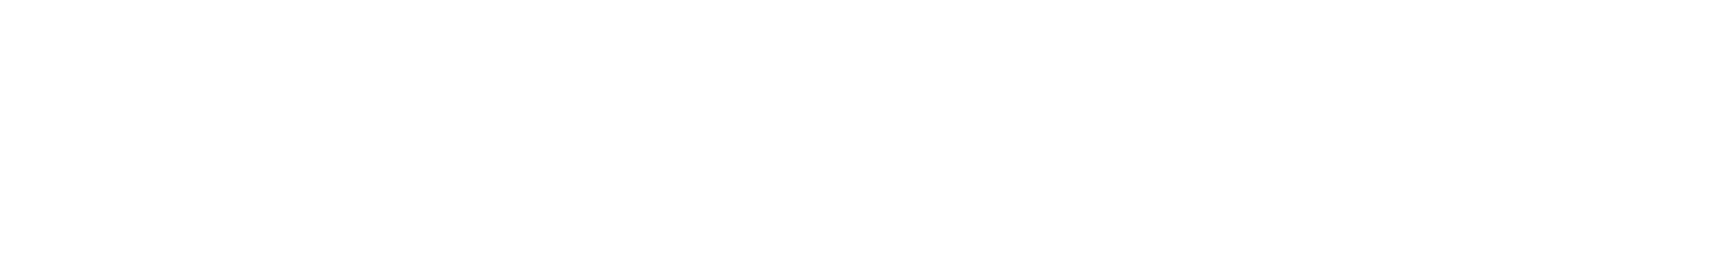 Inspire 1 - Specs, FAQ, manual, video tutorials and DJI GO - DJI